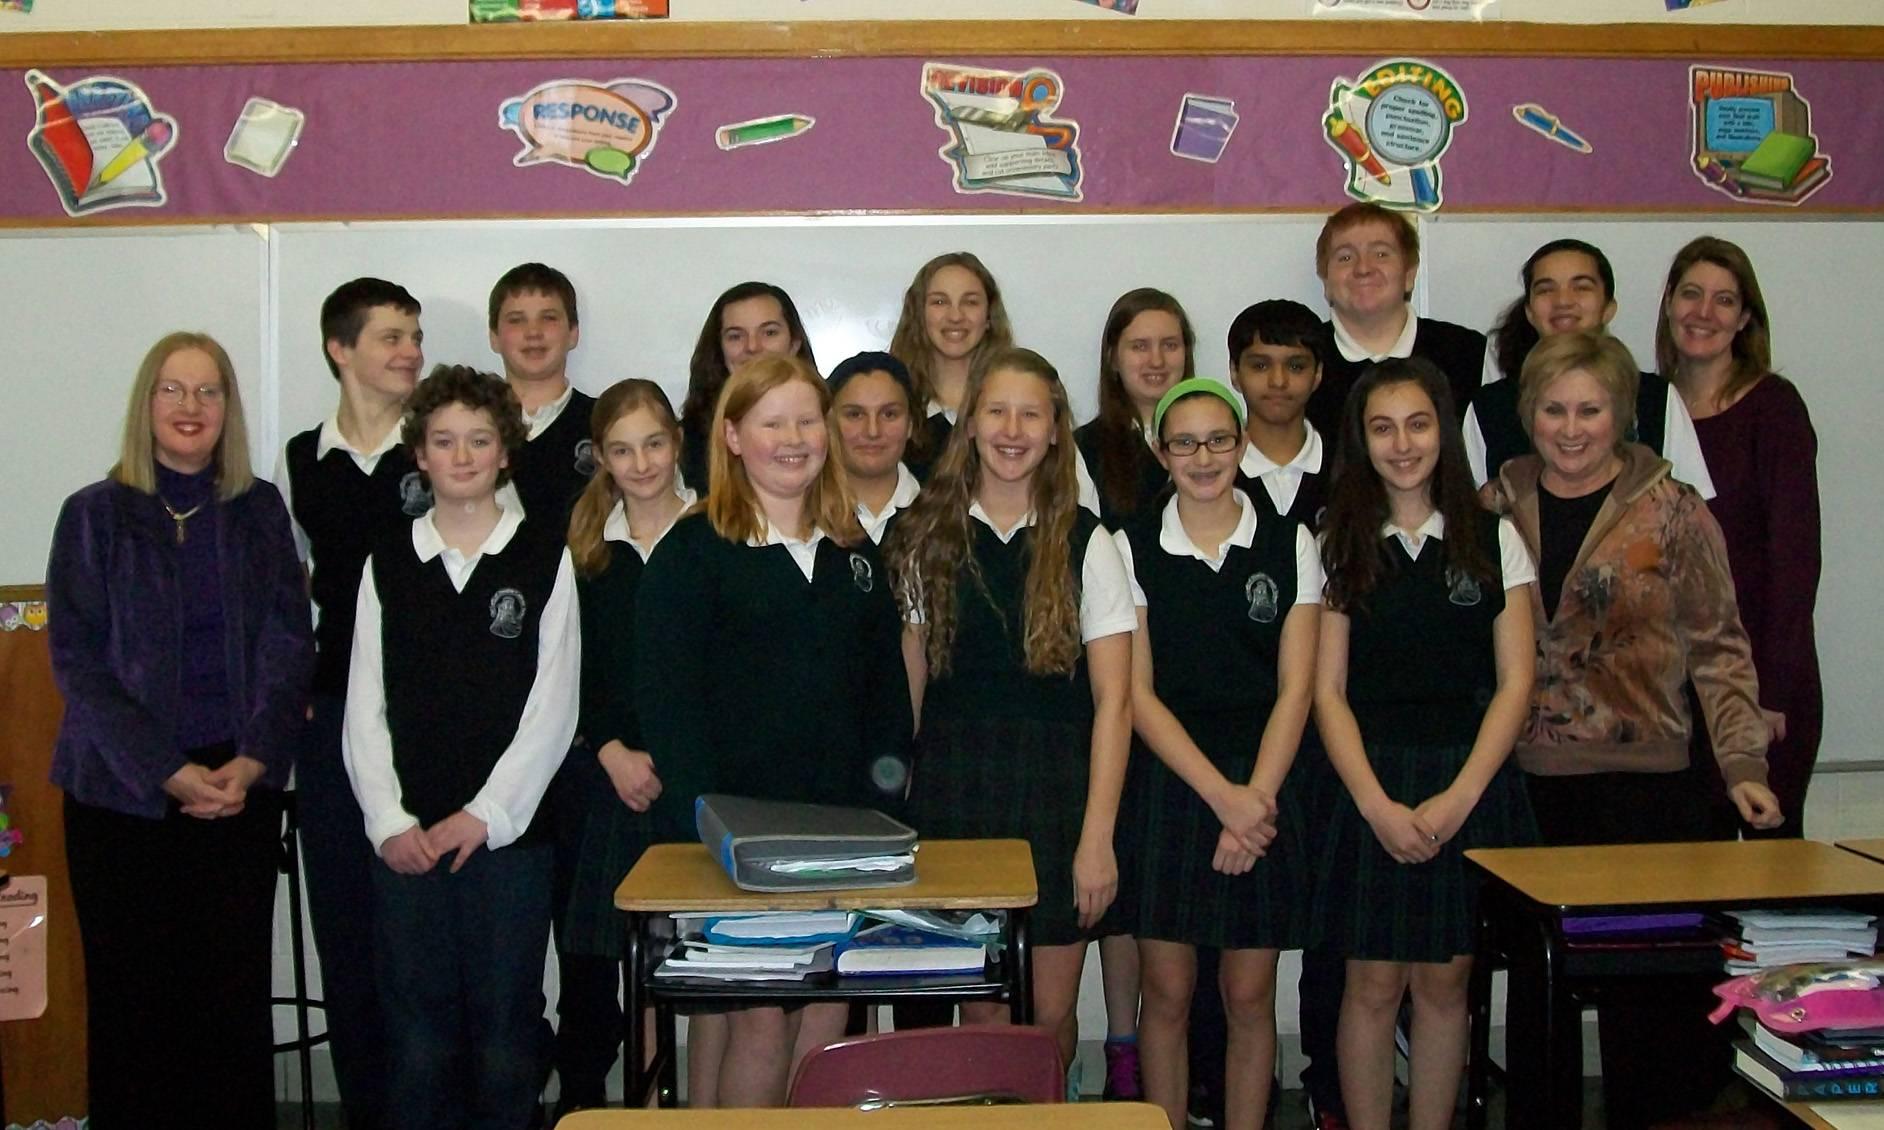 catholic schools week 2010 essay contest